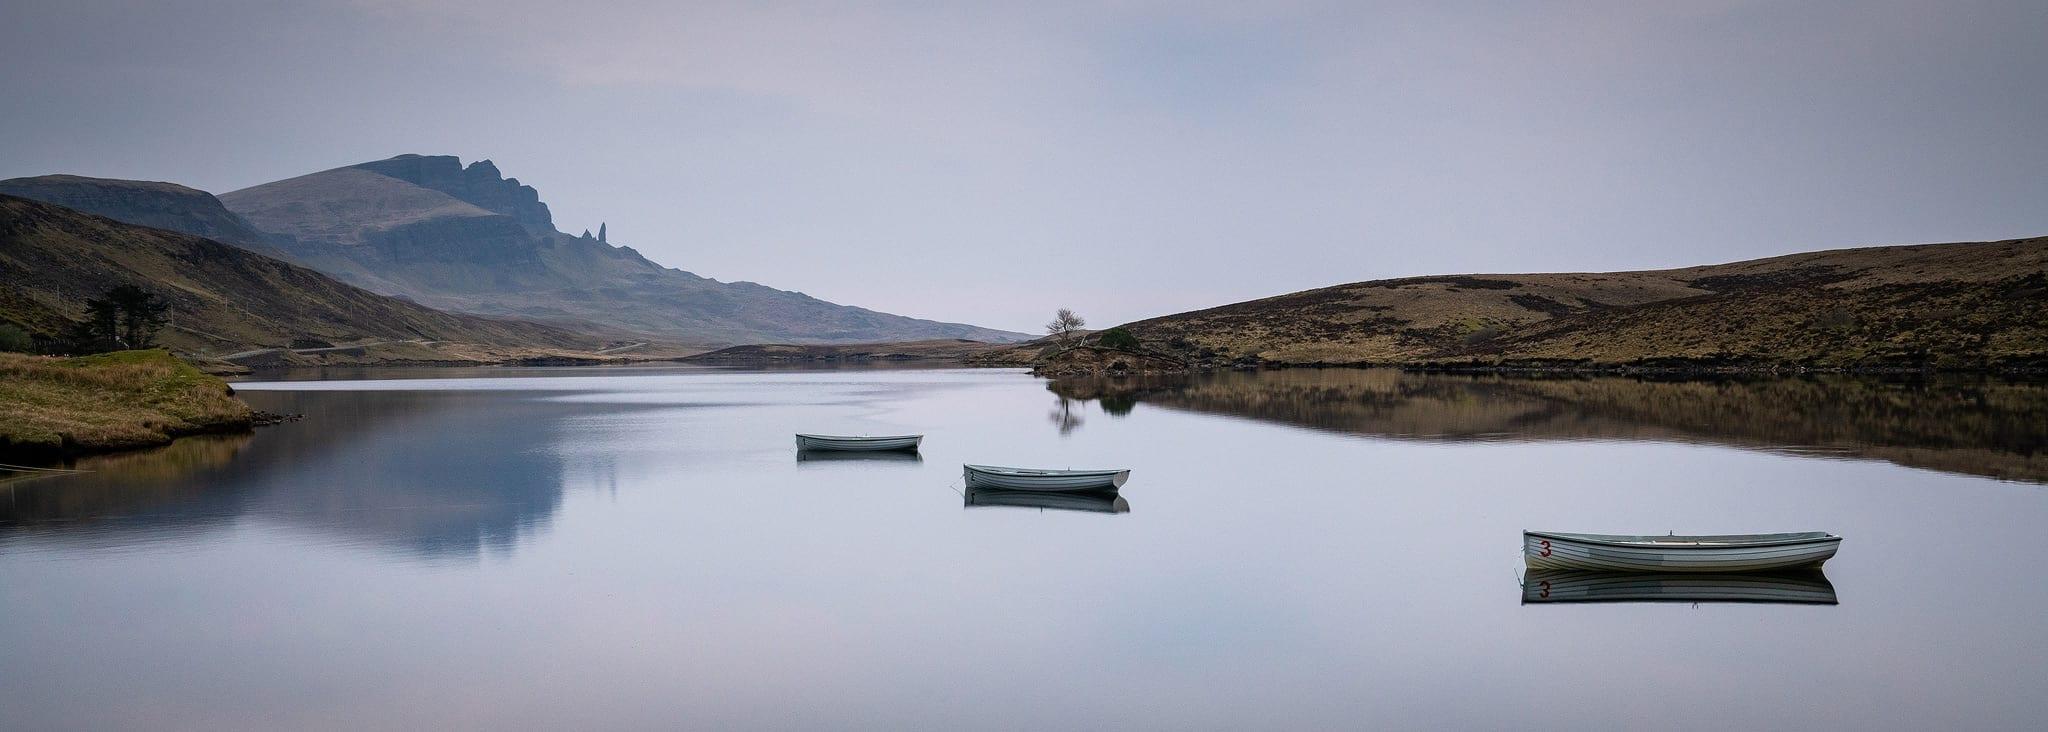 Loch Fada Reflections - Isle of Skye Scotland Landscape Photogra